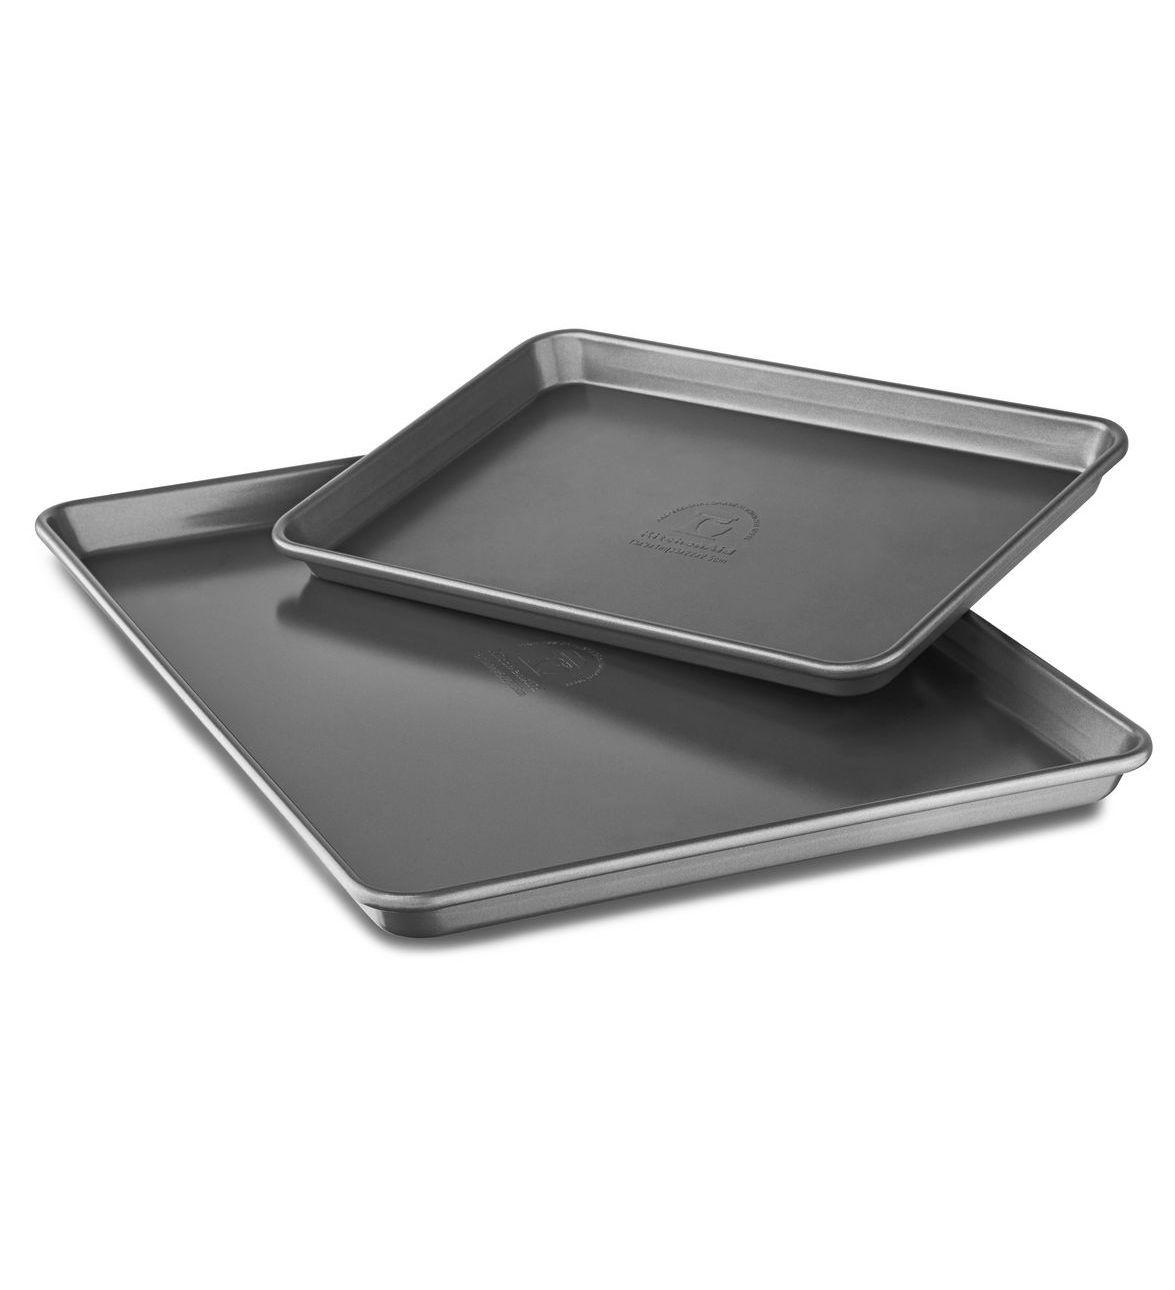 kitchenaid nonstick quarter sheet and half sheet pans set of 2 rh pinterest com